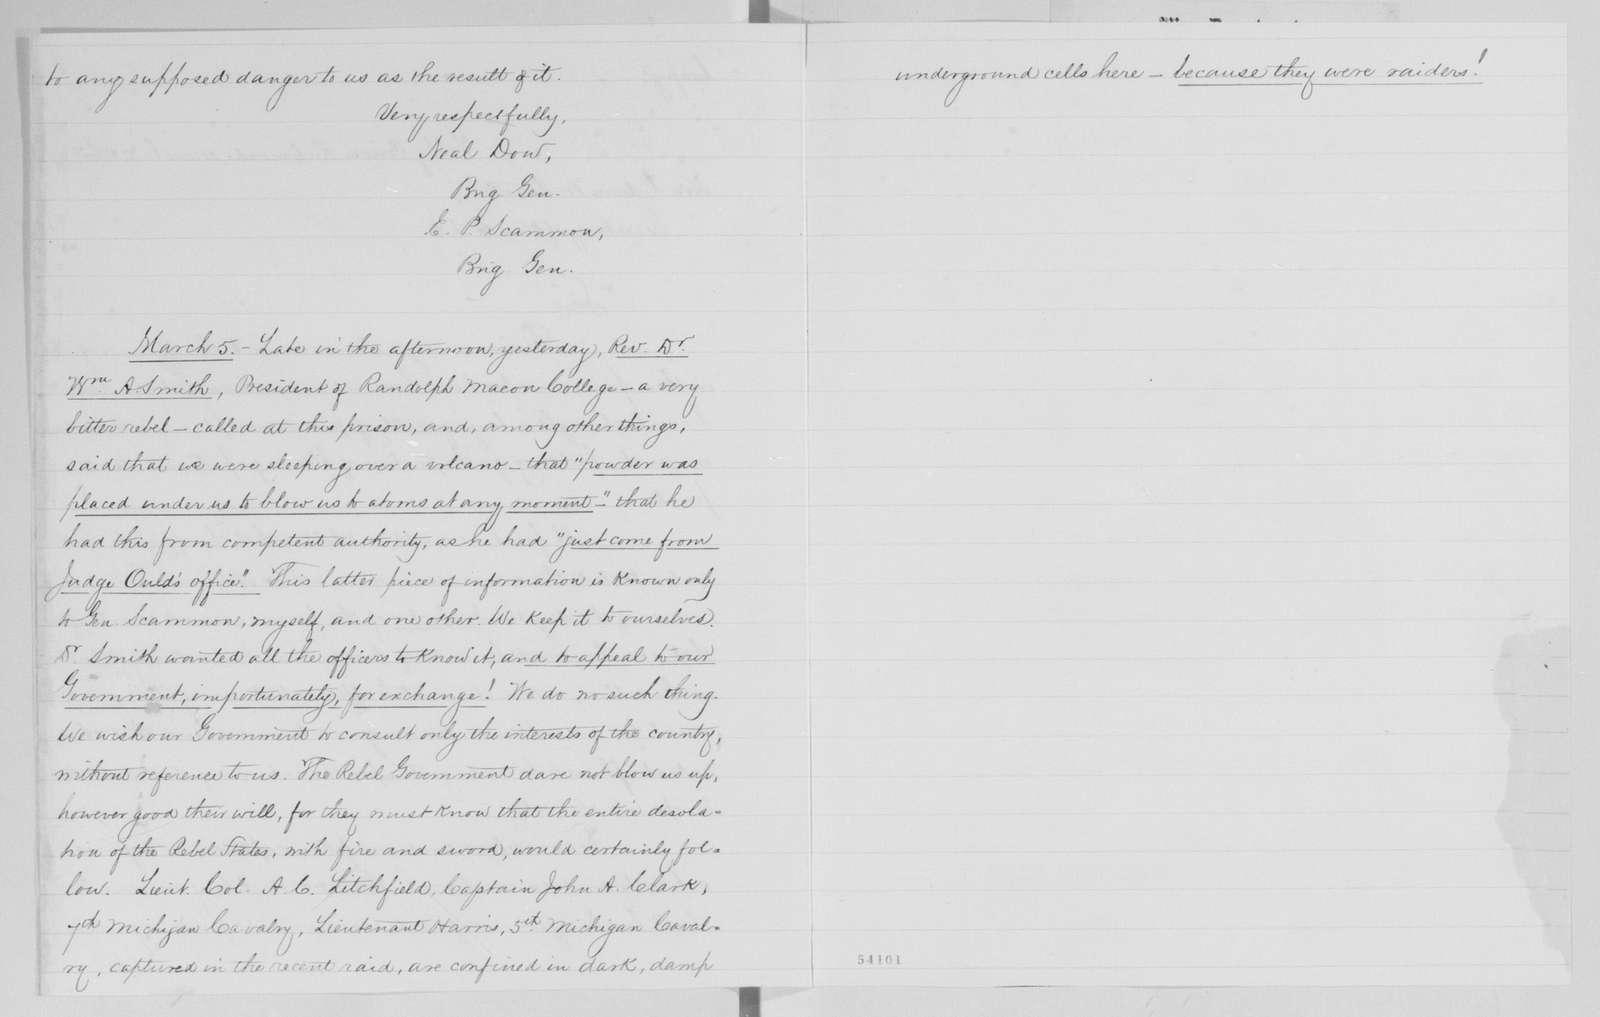 Edwin McMasters Stanton Papers: Correspondence, 1831-1870; 1864; 1864, Feb. 28-June 20